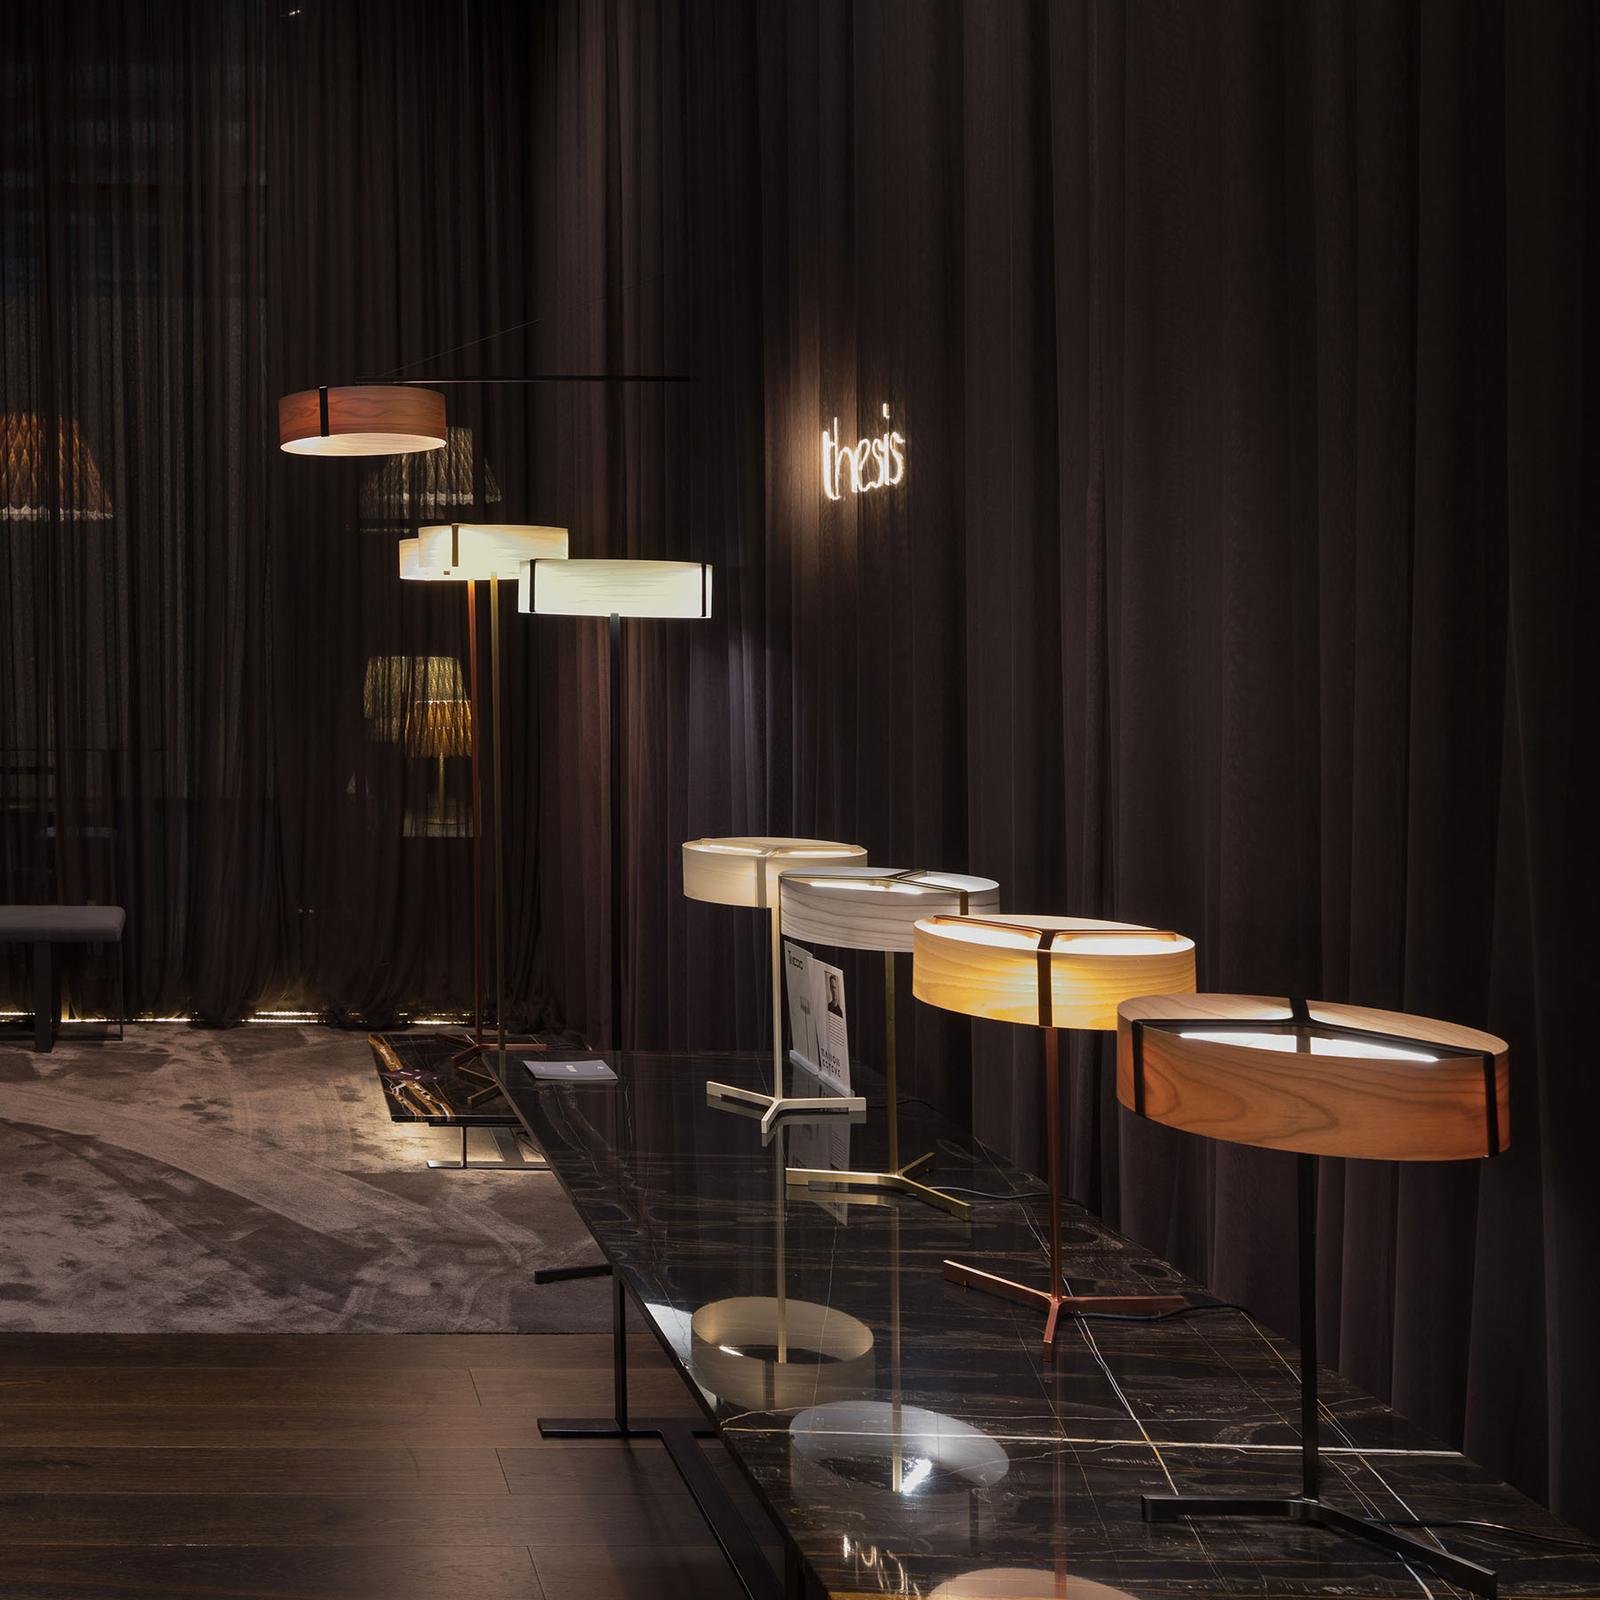 LZF Thesis -LED-pöytälamppu, musta/kirsikkapuu